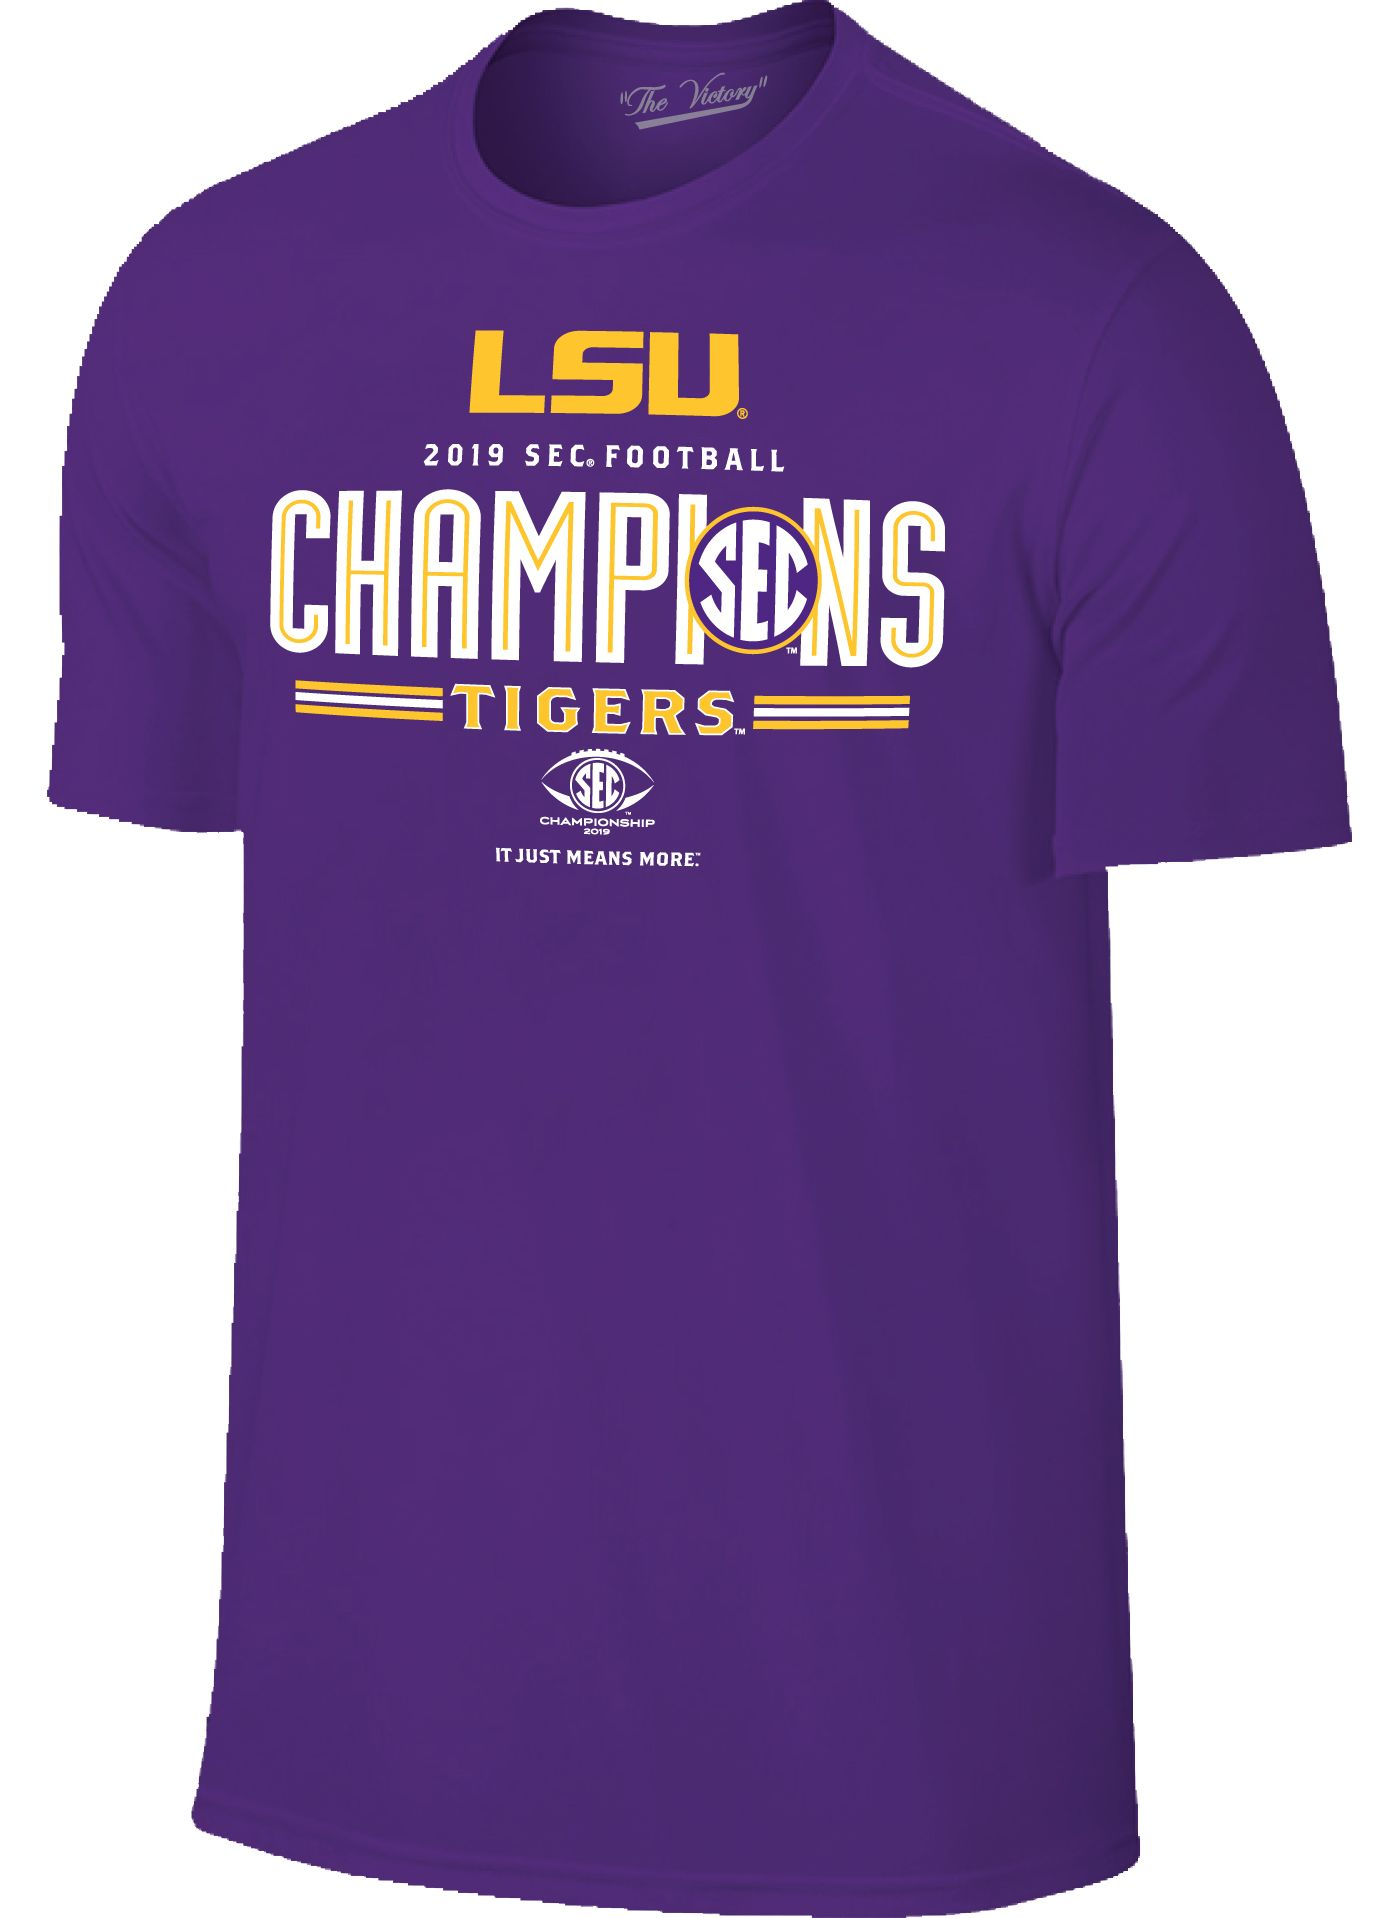 The Victory Men's 2019 SEC Football Champions LSU Tigers Locker Room T-Shirt